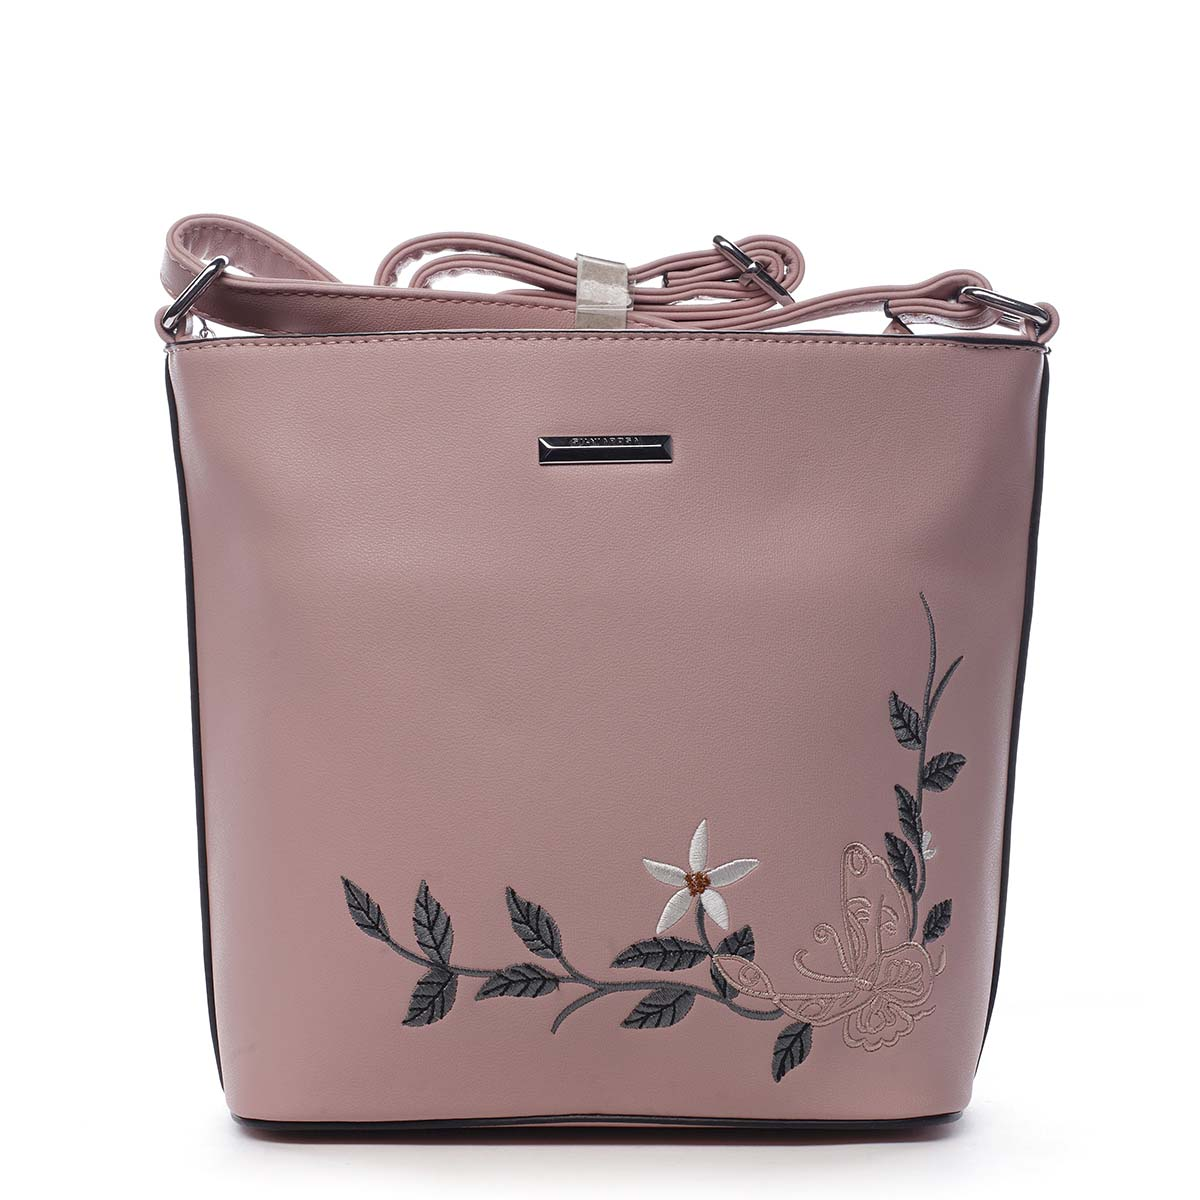 Dámská crossbody kabelka růžová - Silvia Rosa Believa růžová